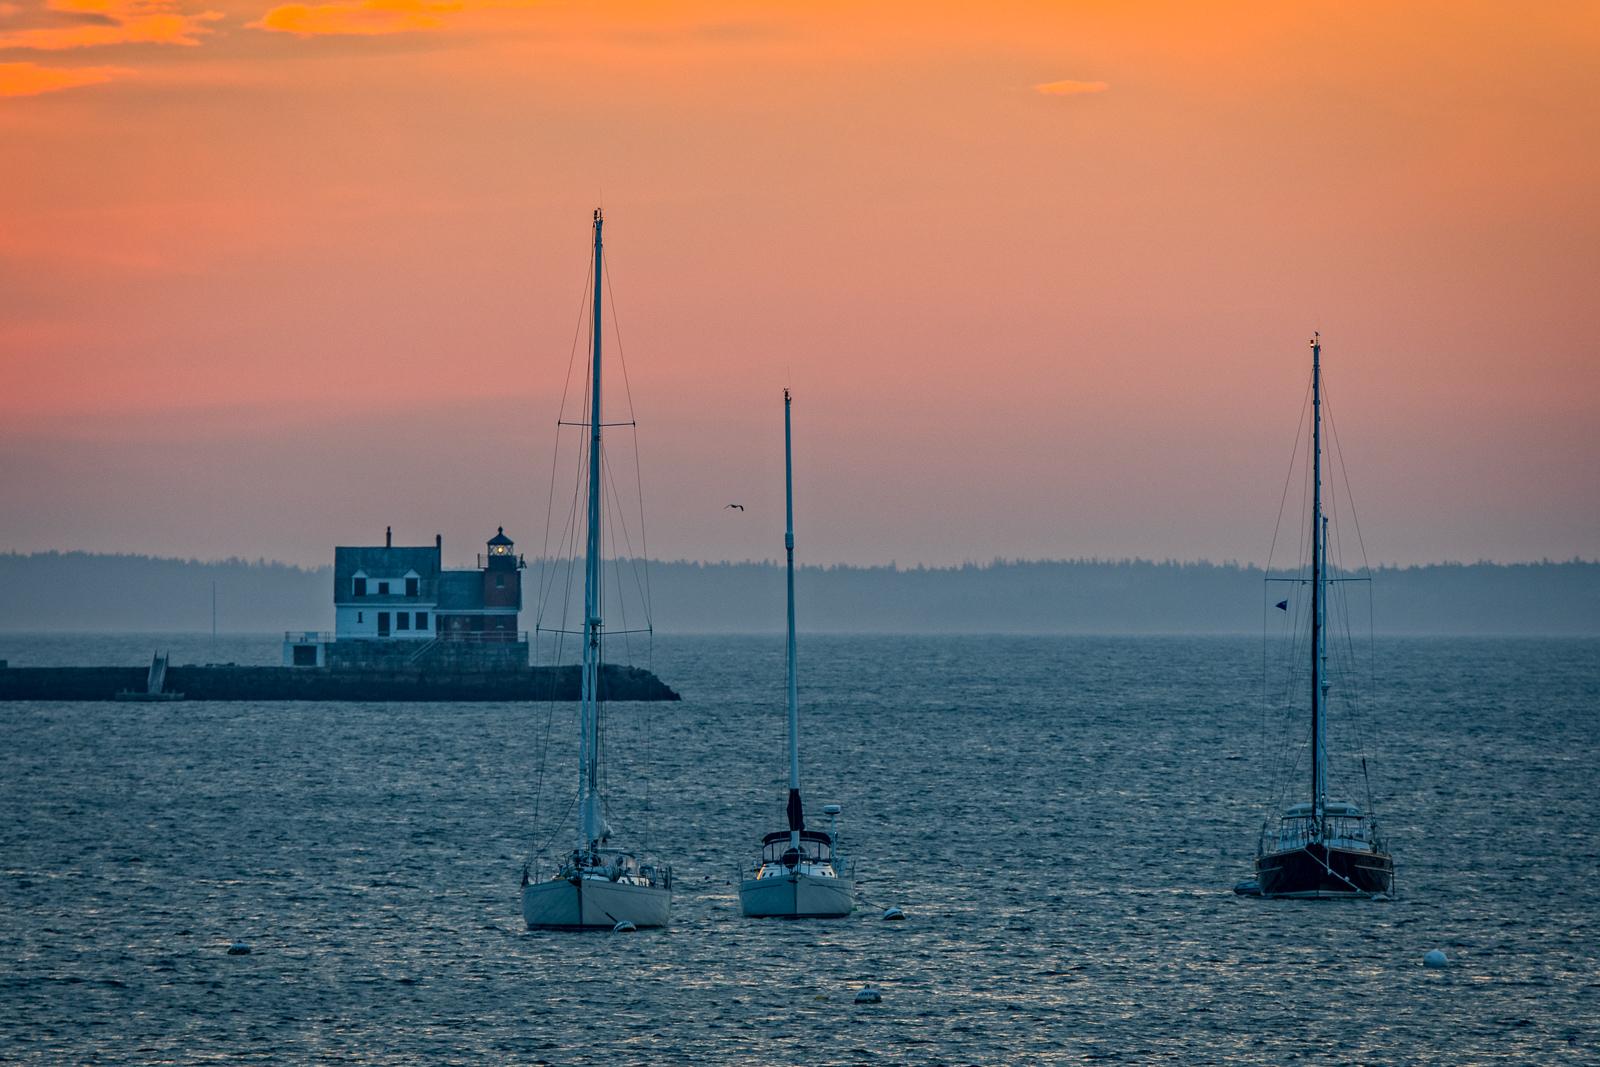 Maine, Rockland, harbor, lighthouse, light, sky, sunrise, mid coast